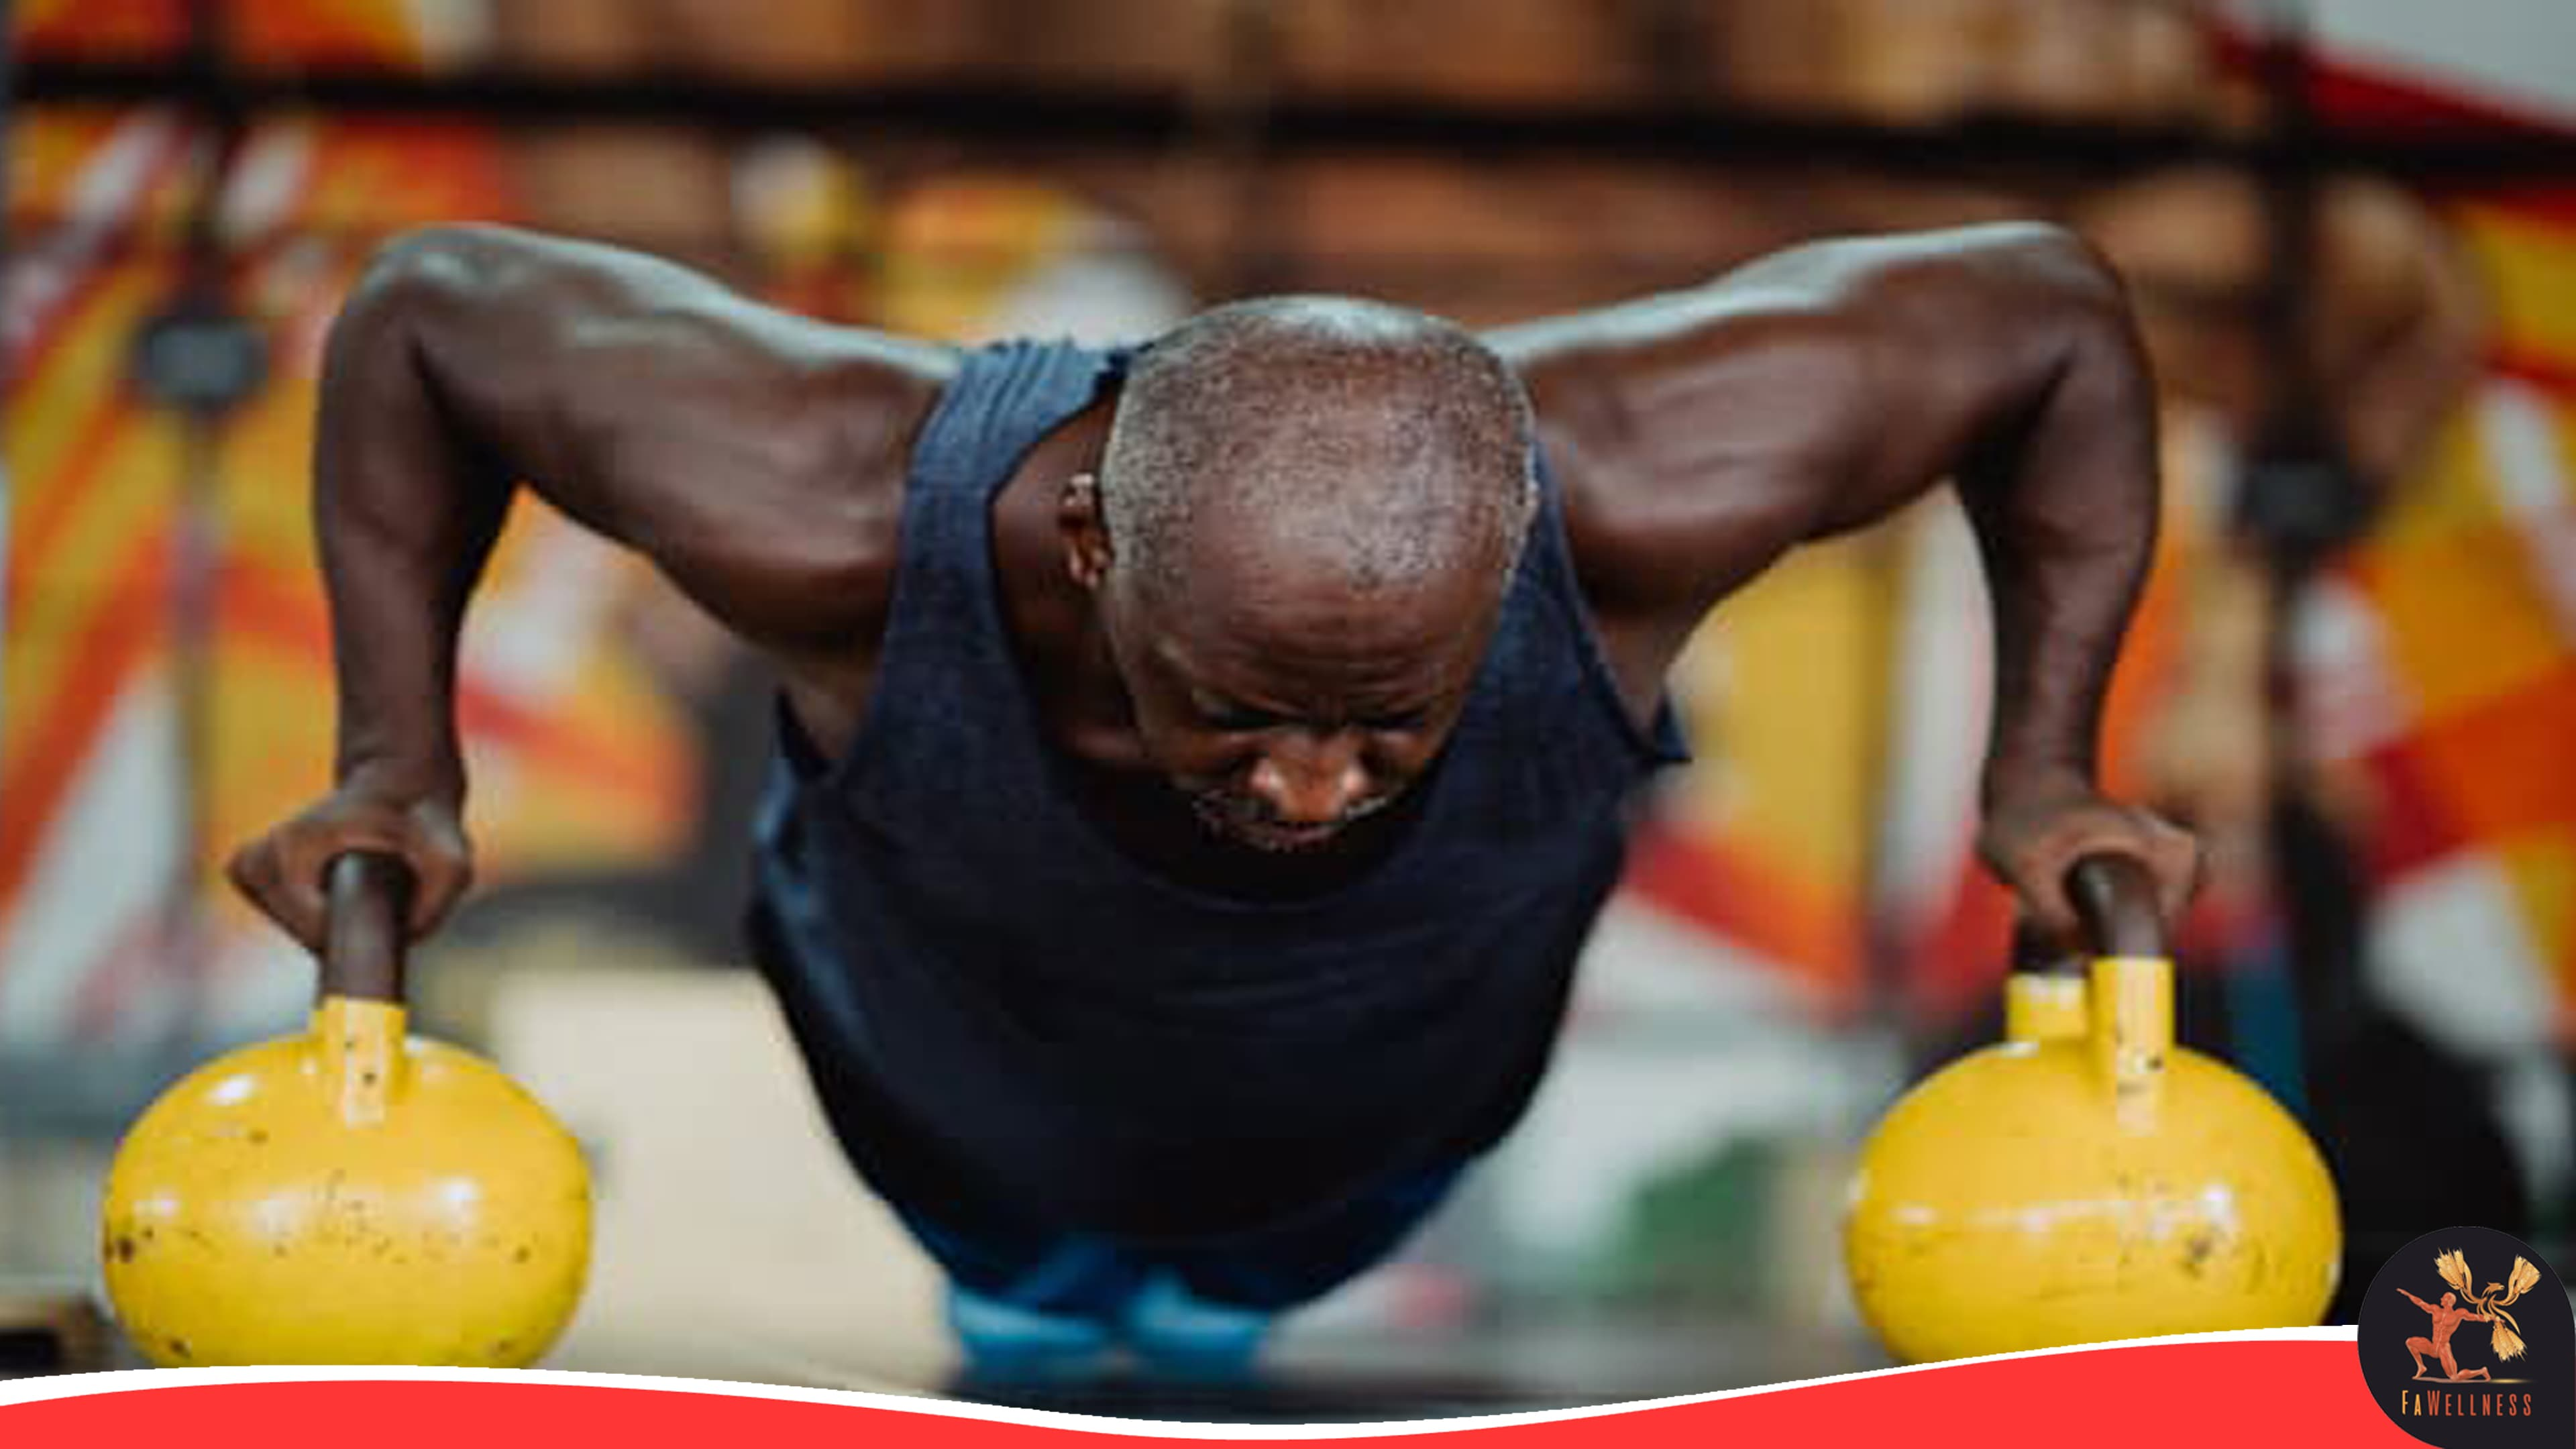 imagen blog FaWellness | El ejercicio, la mejor medicina